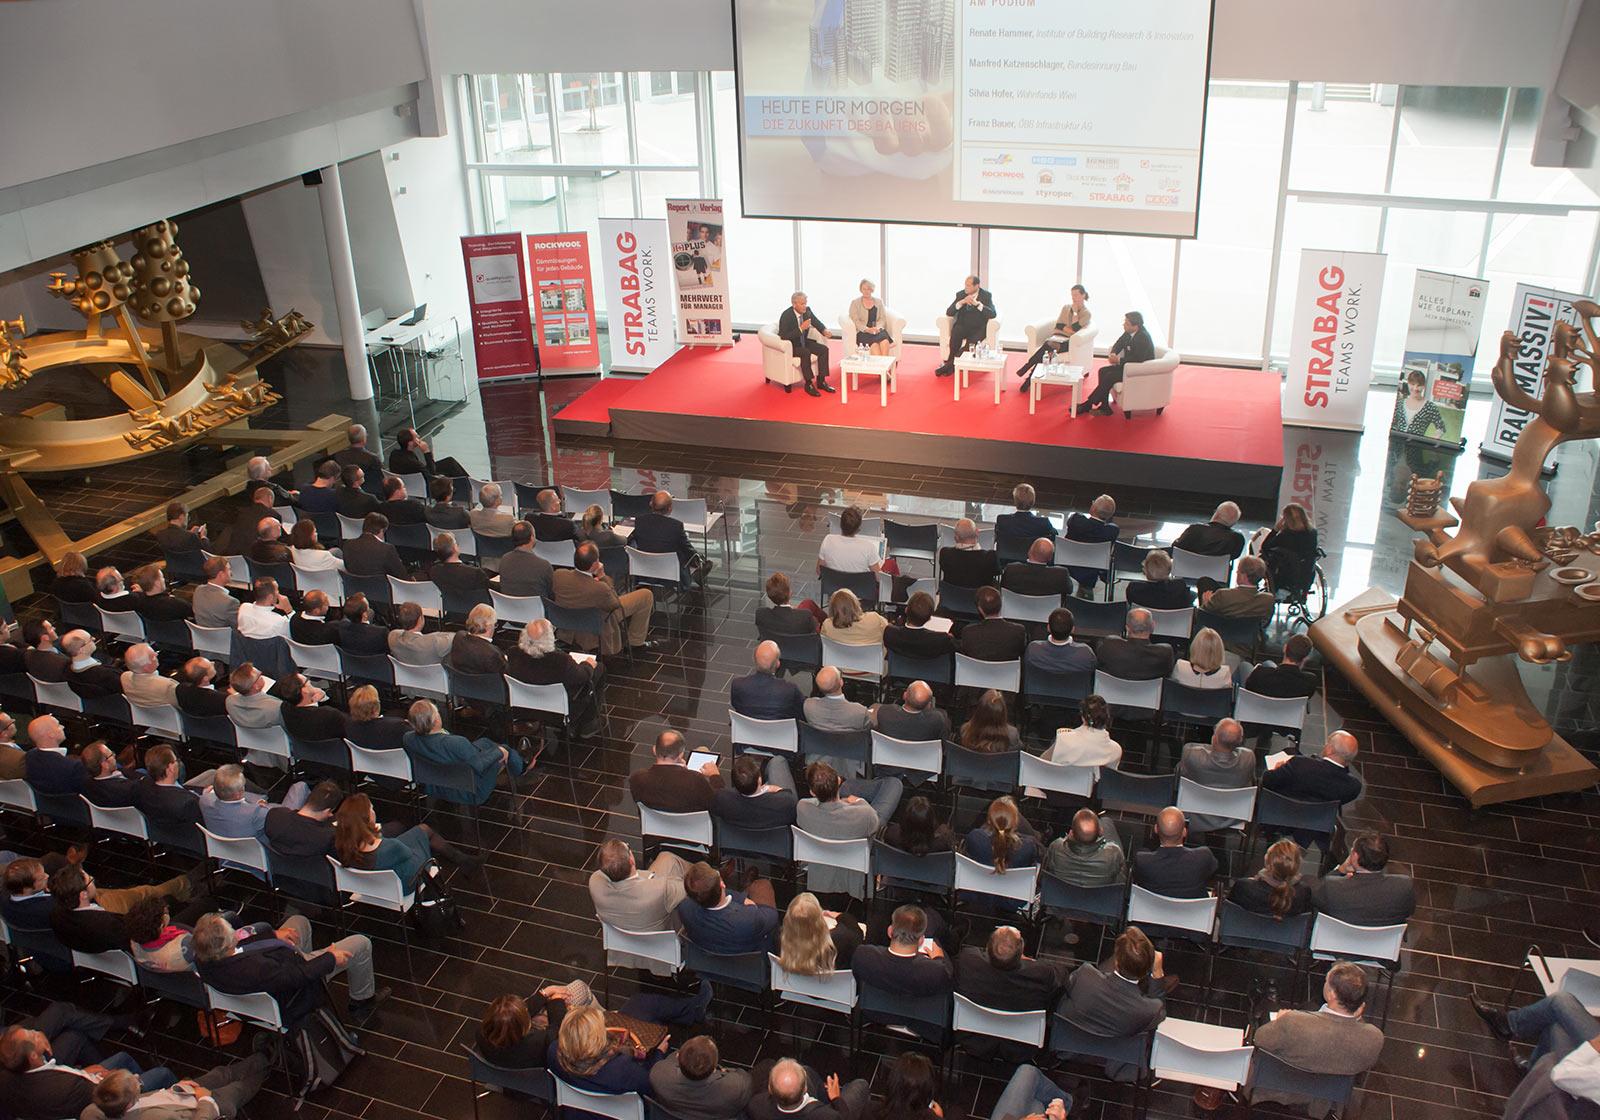 Конференция «Возможности зданий». Источник фото: Milena Krobath